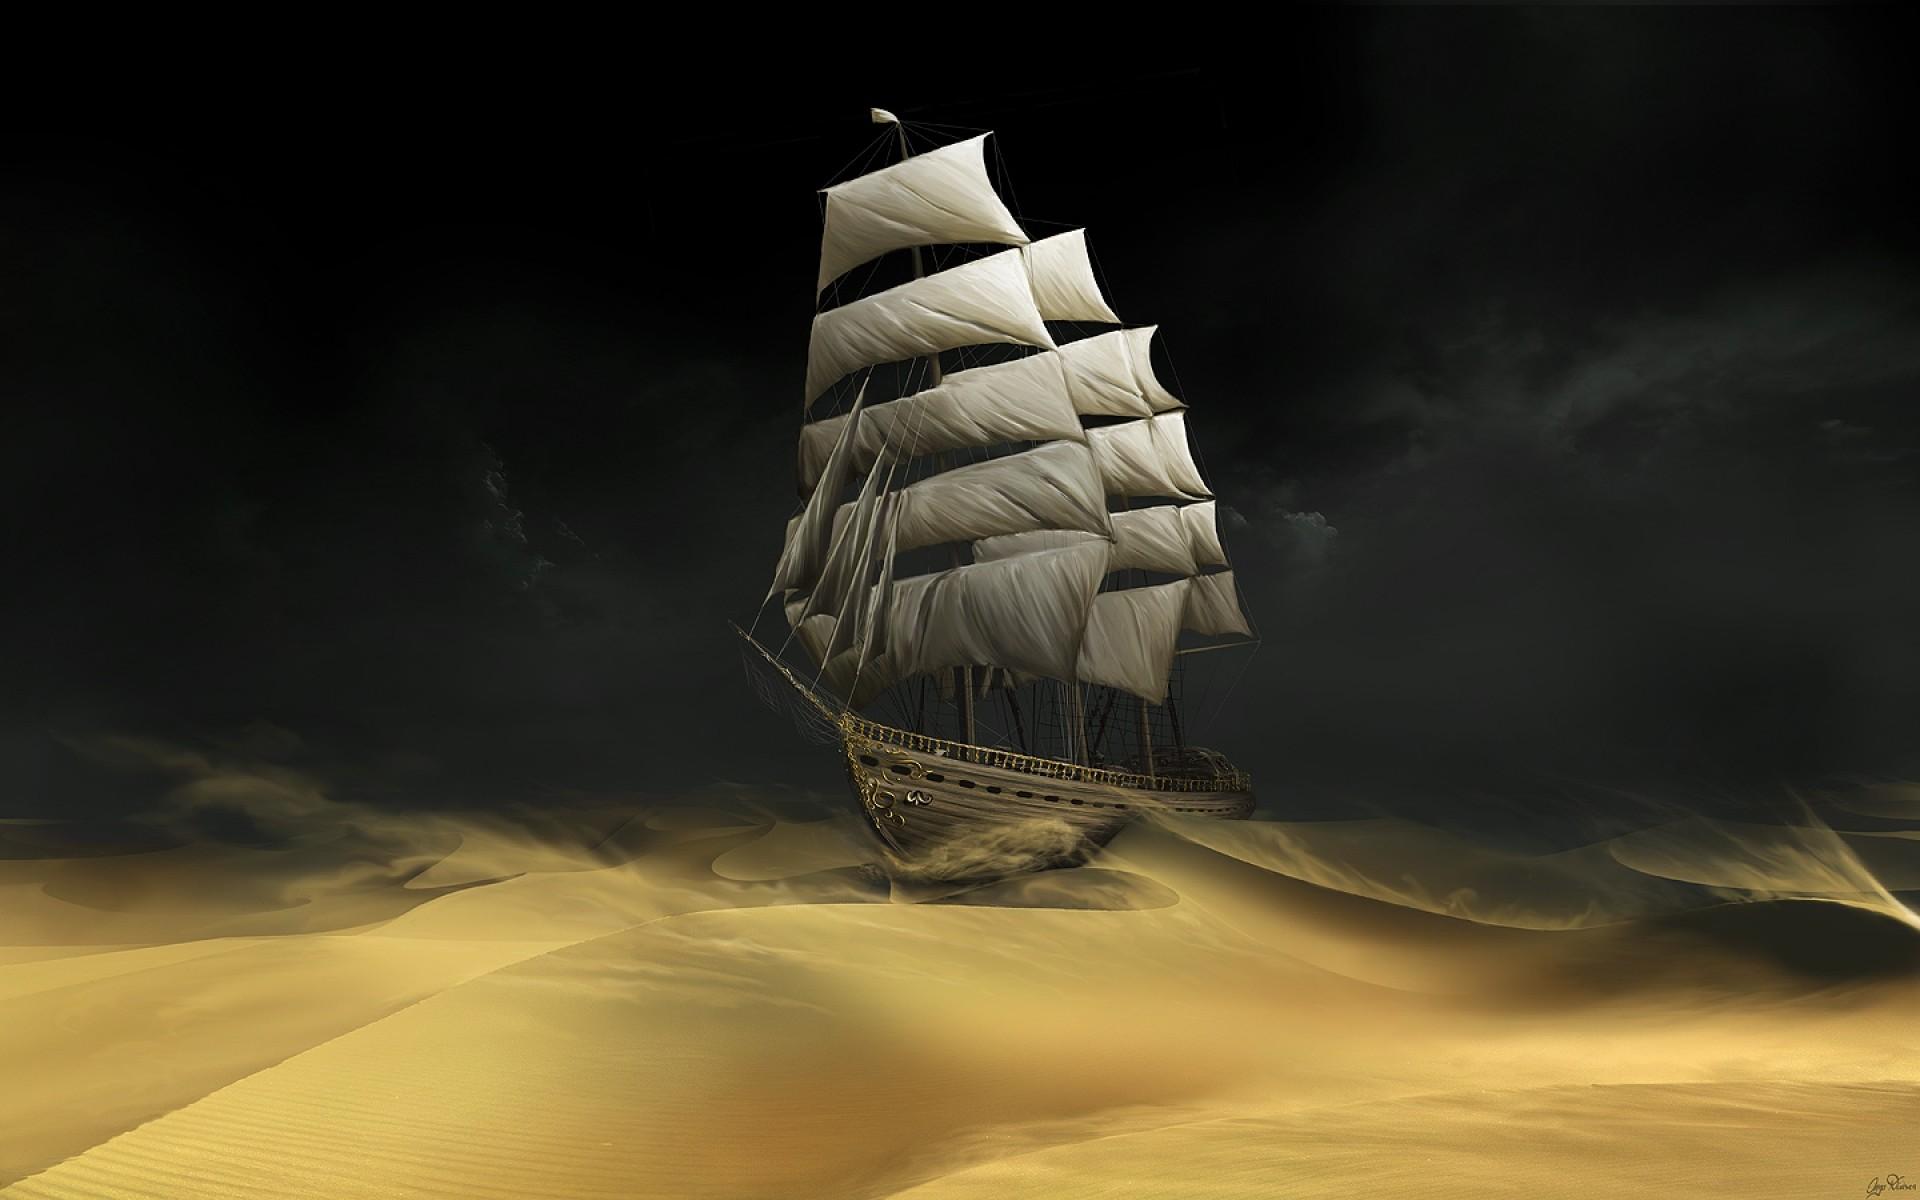 Boat Desert Sailing Hd Jootix 223115 Wallpaper wallpaper